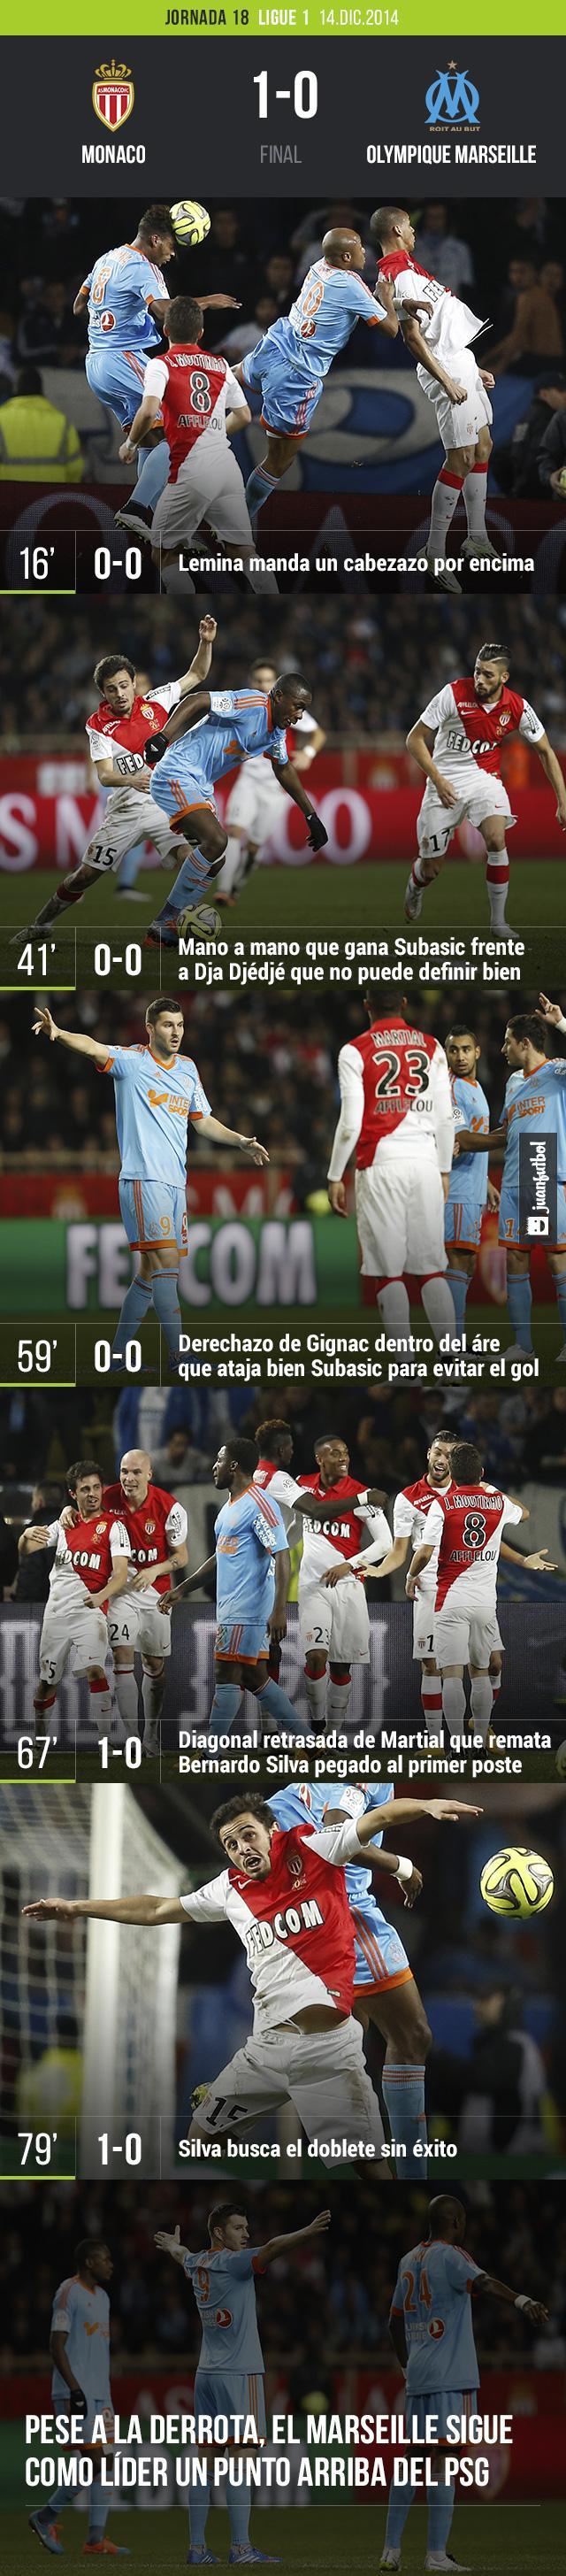 El Monaco vence 1-0 al Marseille con gol de Bernardo Silva